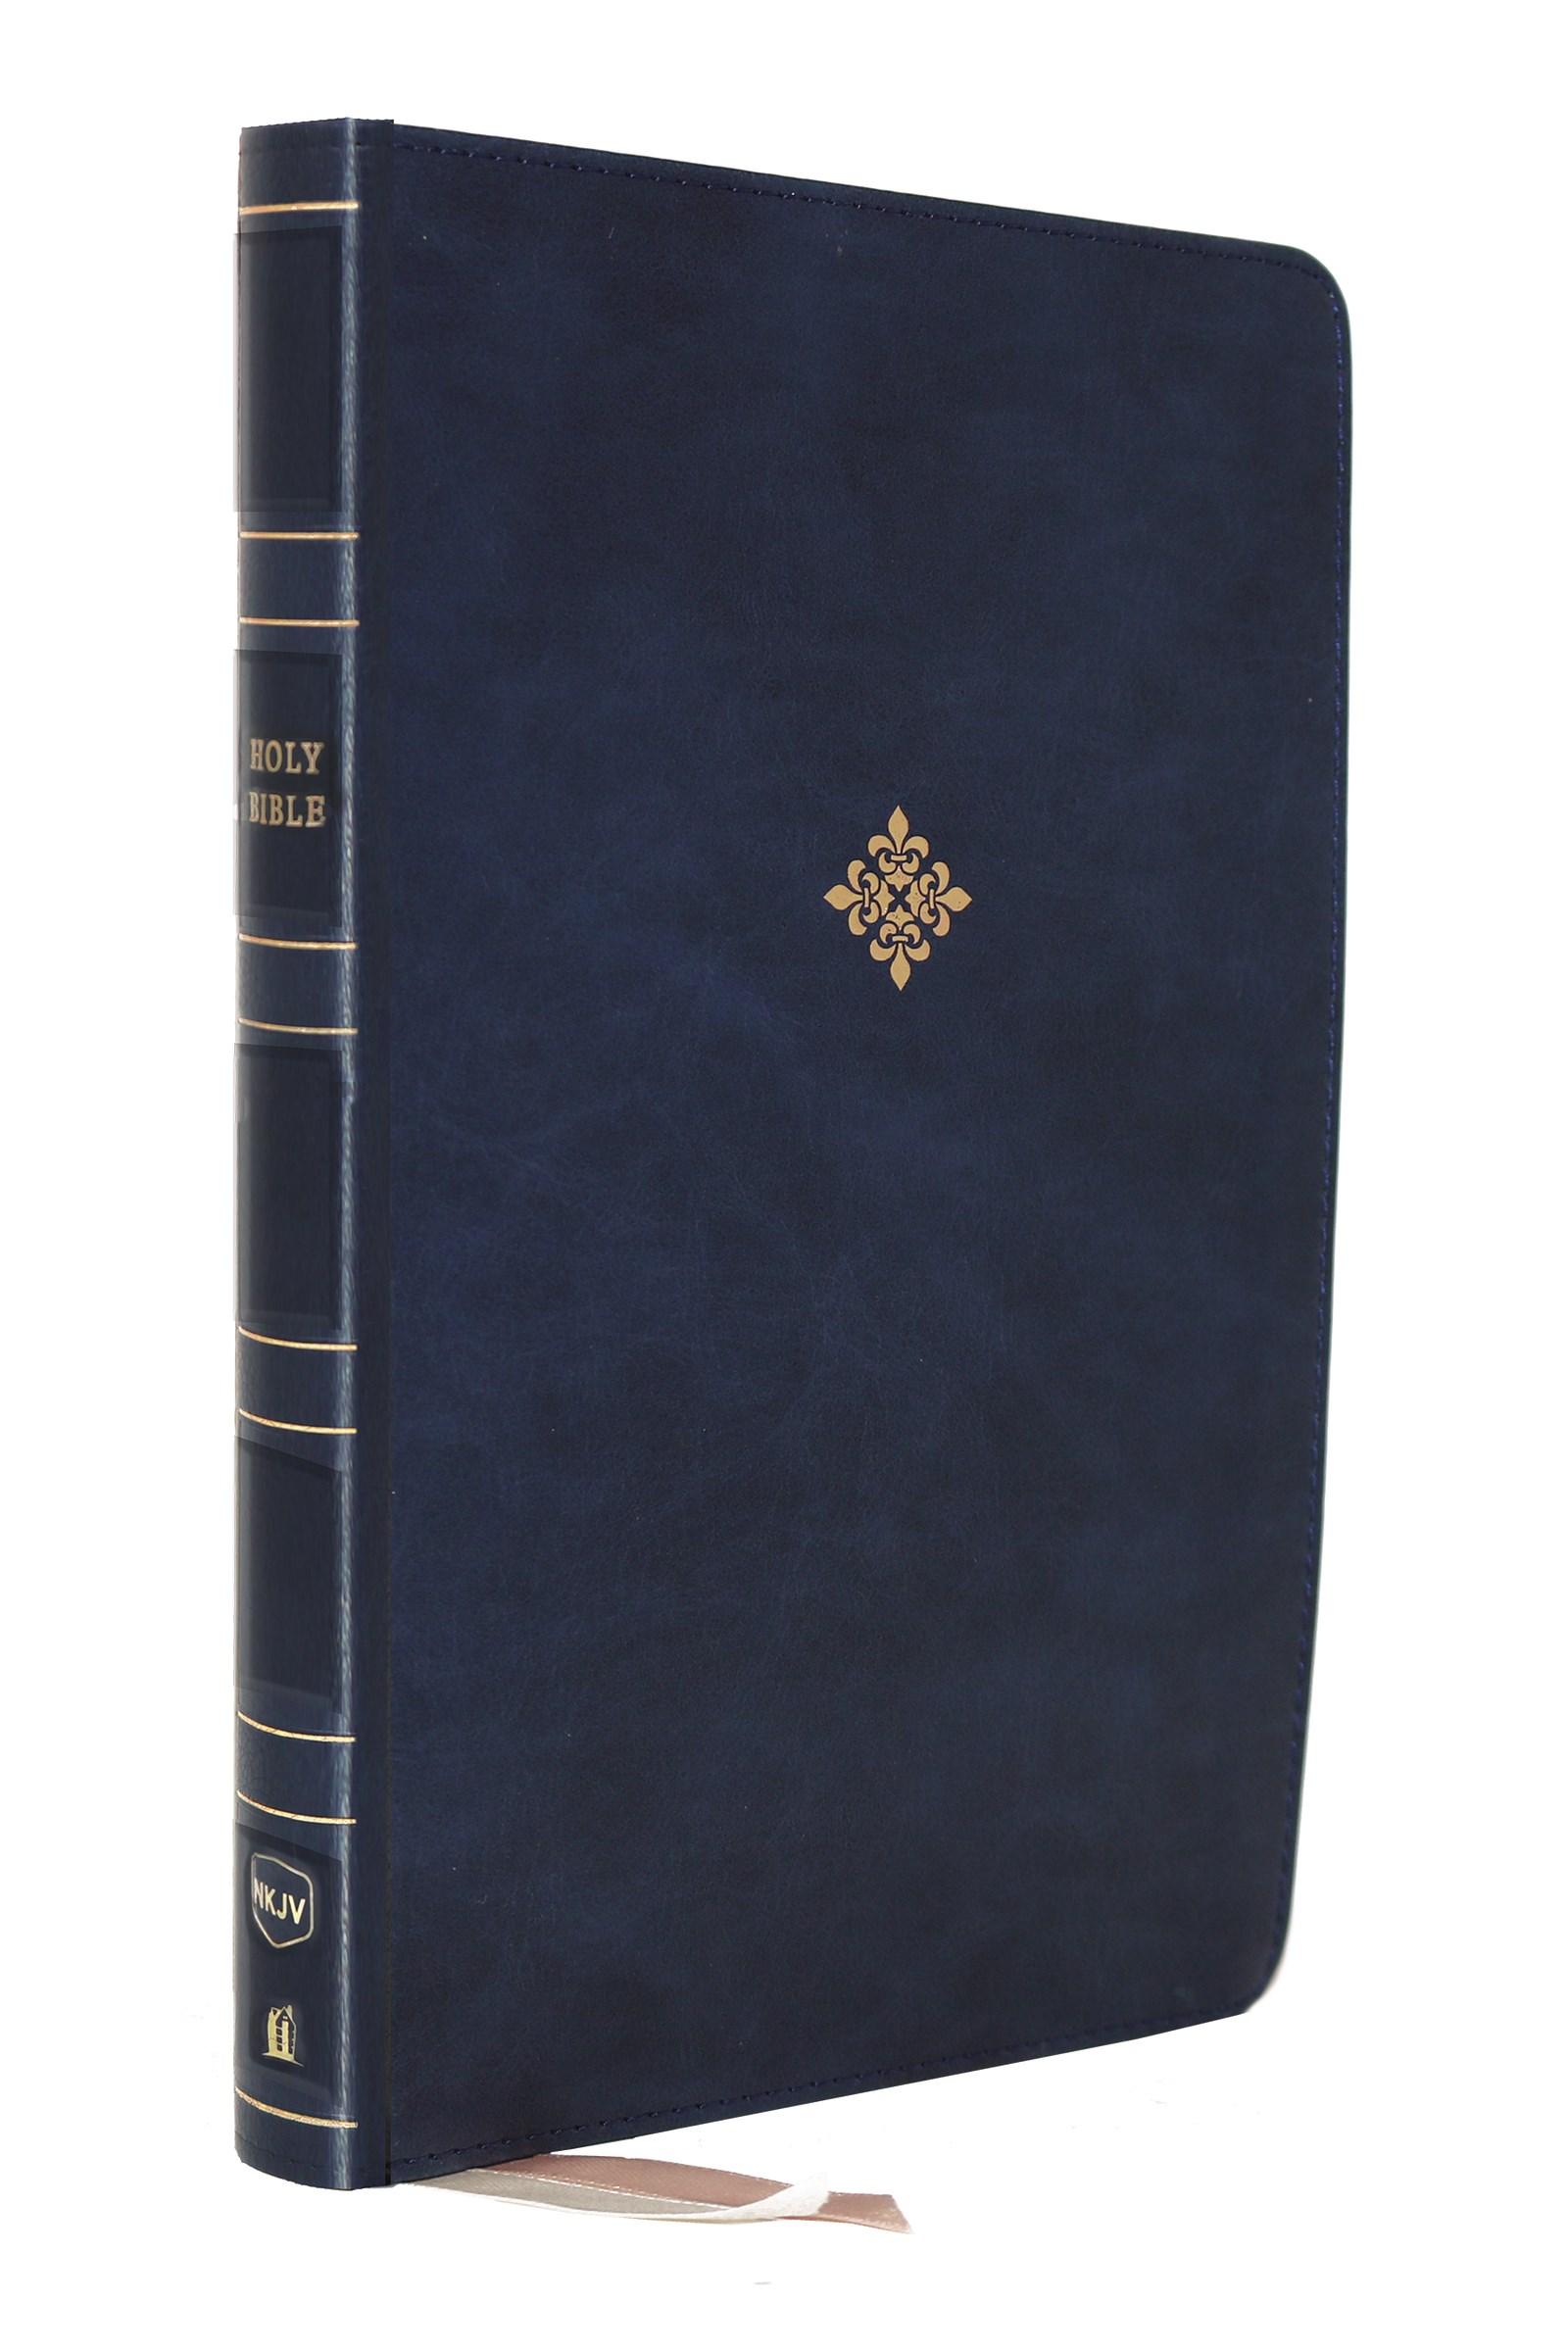 NKJV Large Print Thinline Bible (Comfort Print)-Blue Leathersoft